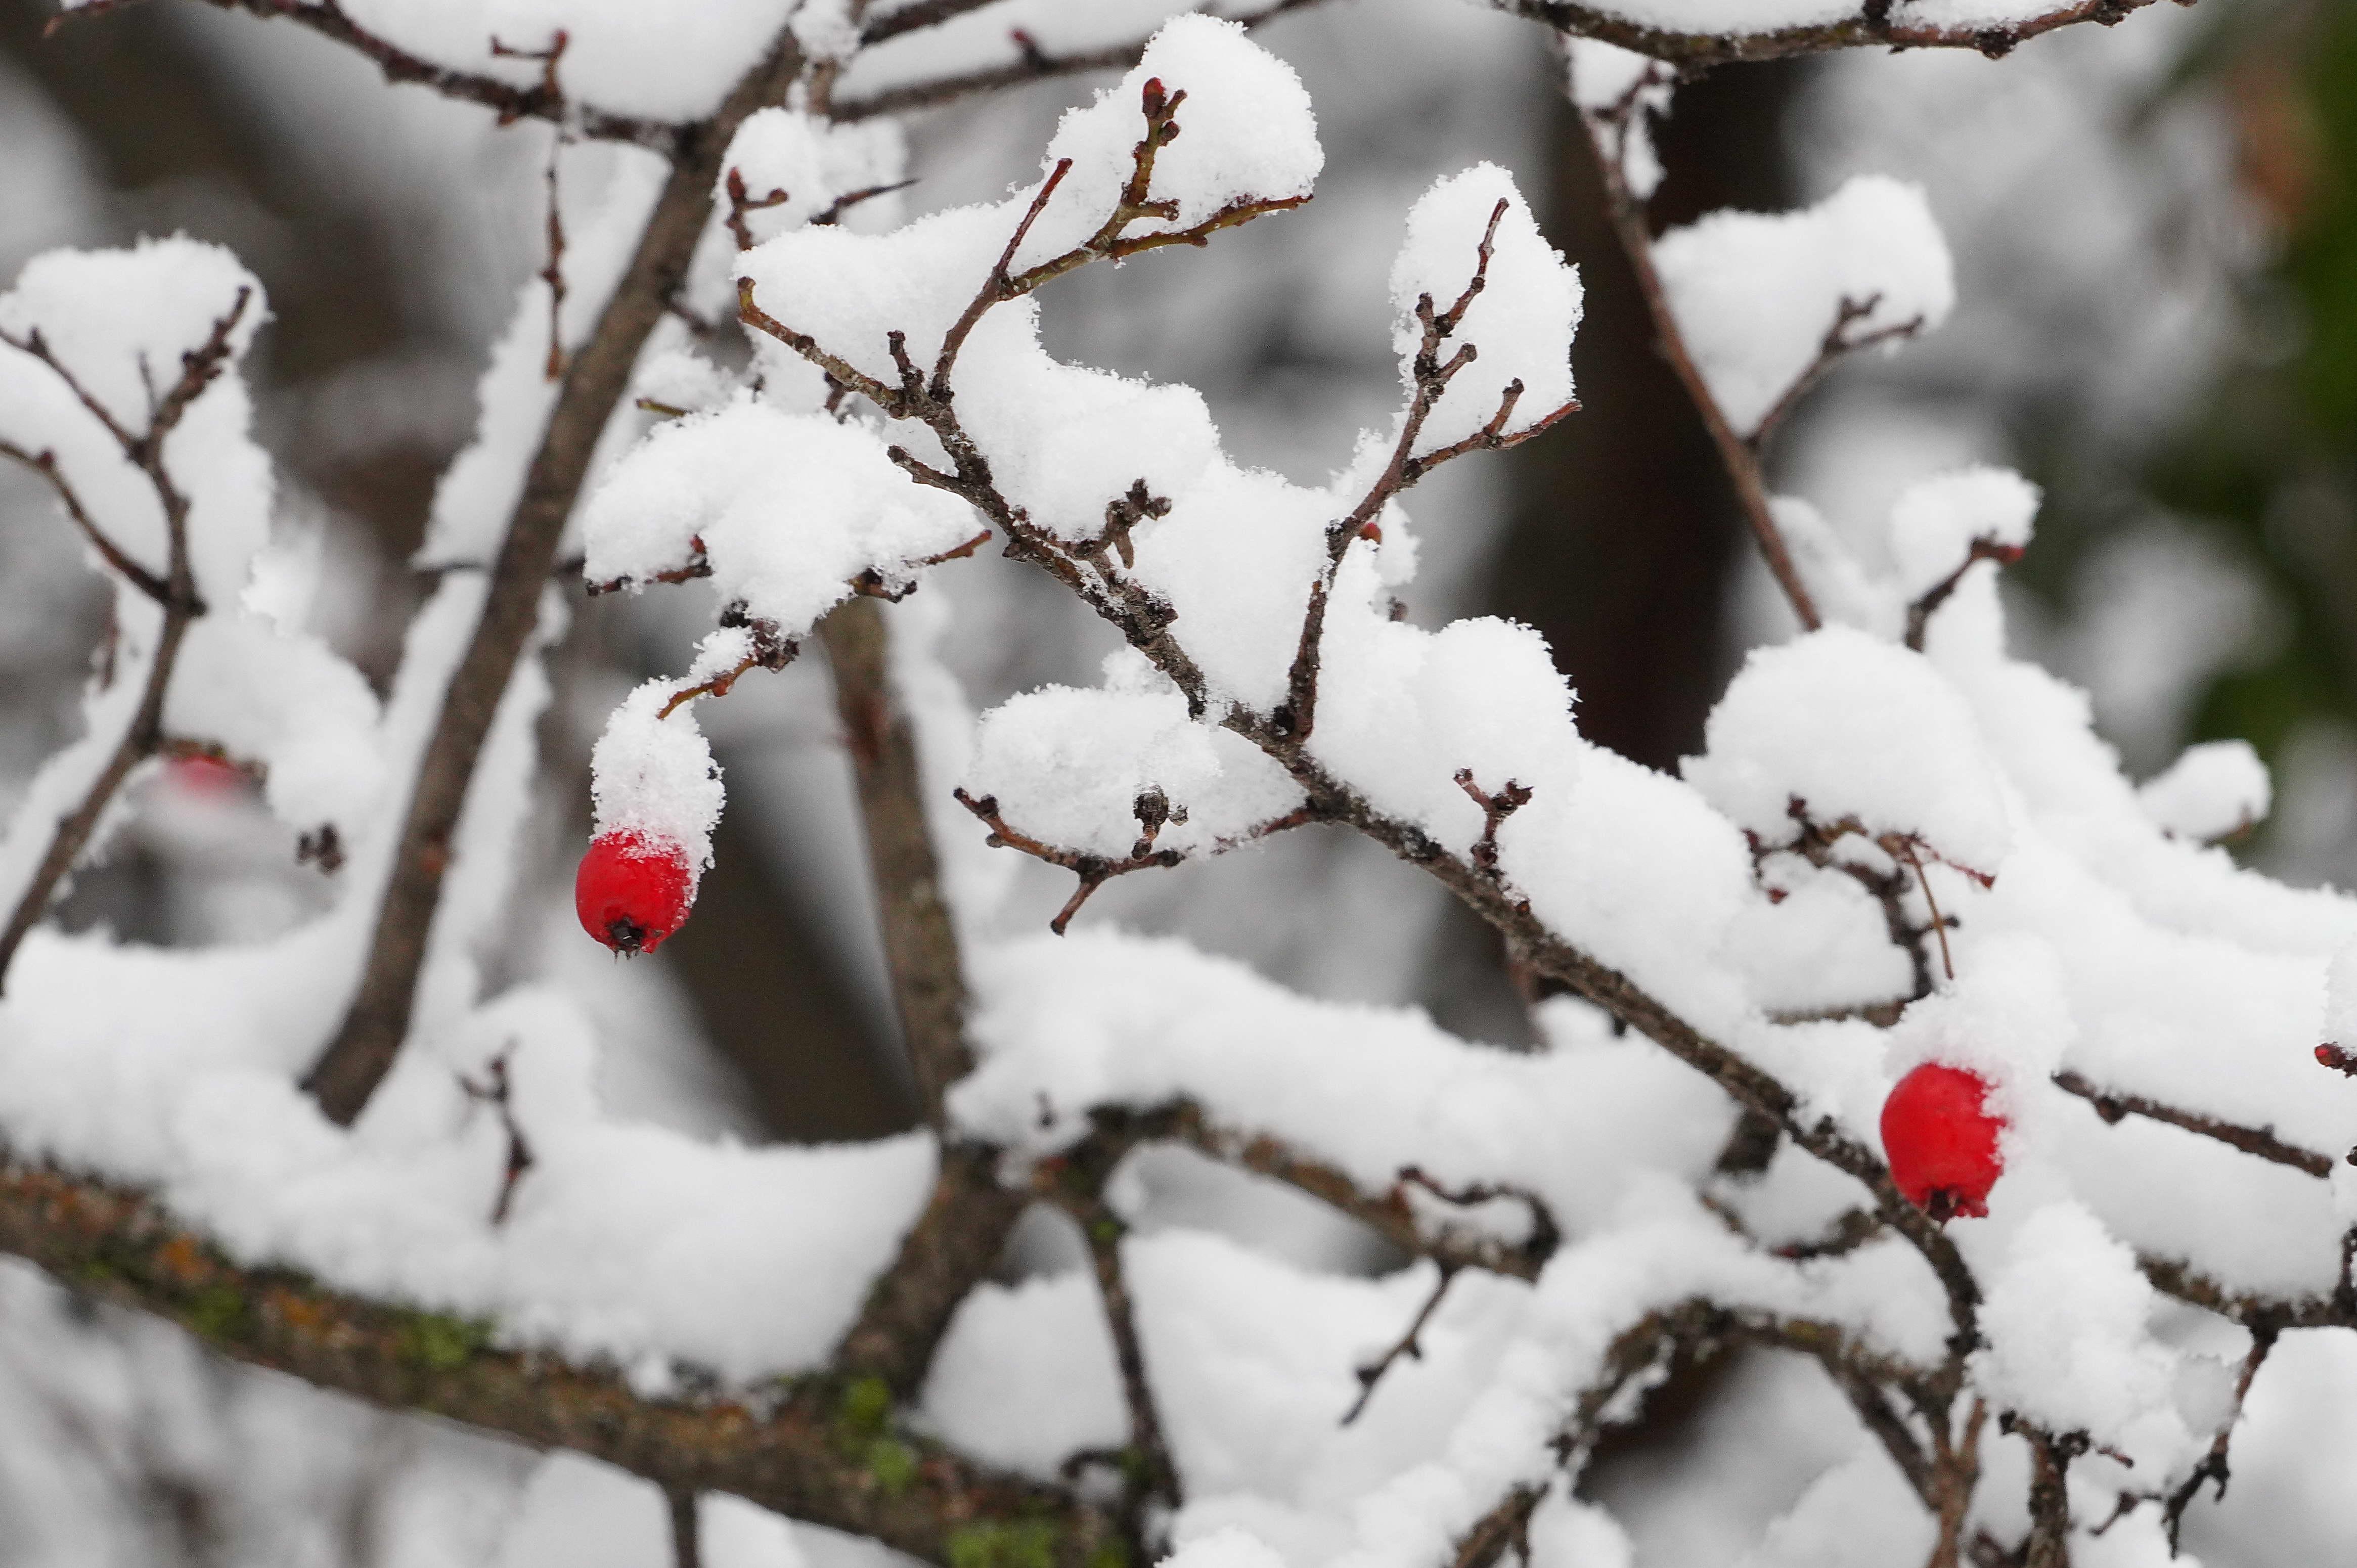 UZBEKISTAN-TASHKENT-SNOWFALL